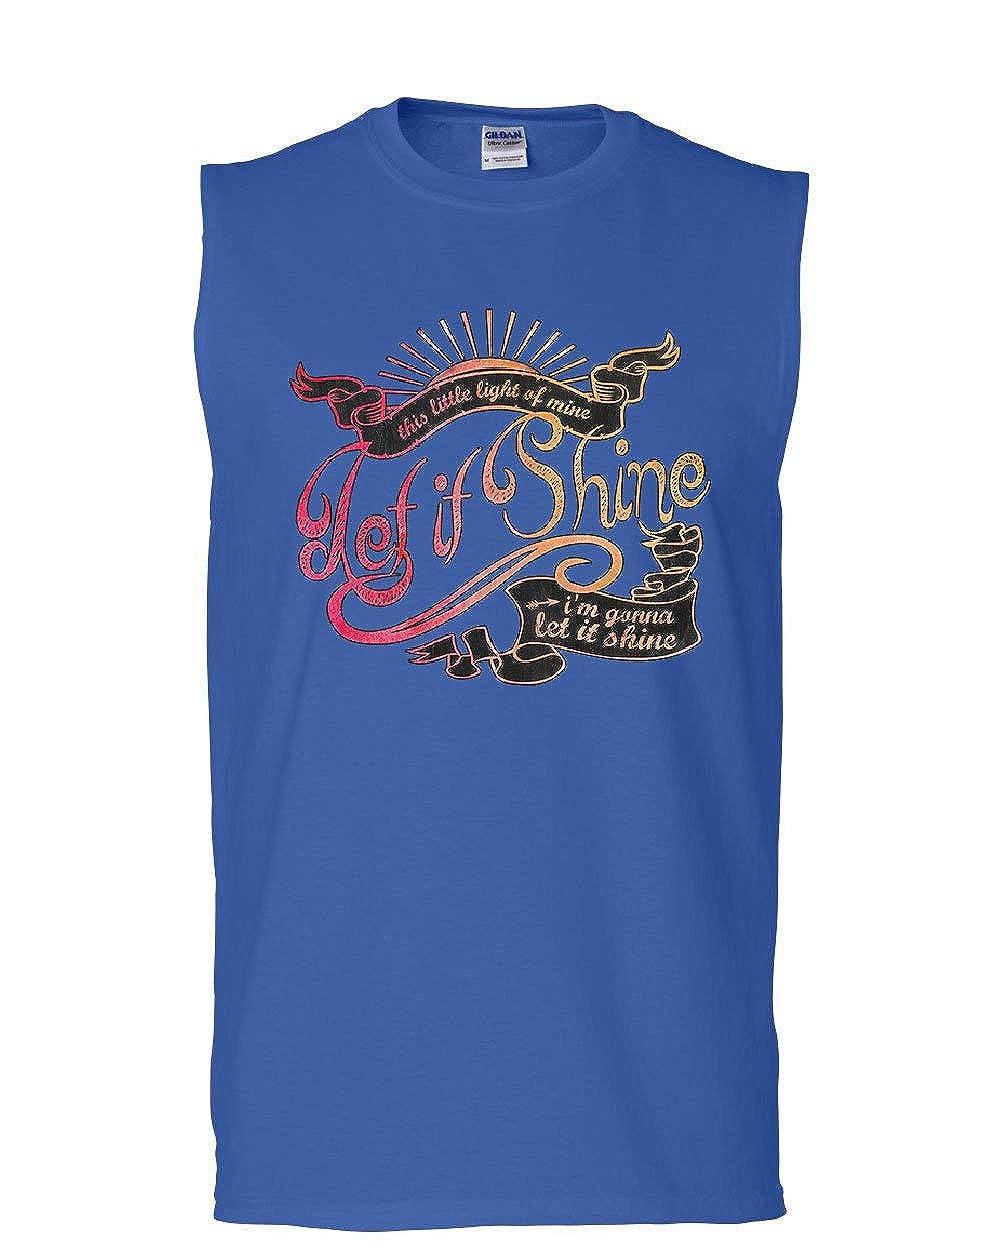 Let It Shine Muscle Shirt Motivational Inspirational Feel Good Vibe Sleeveless